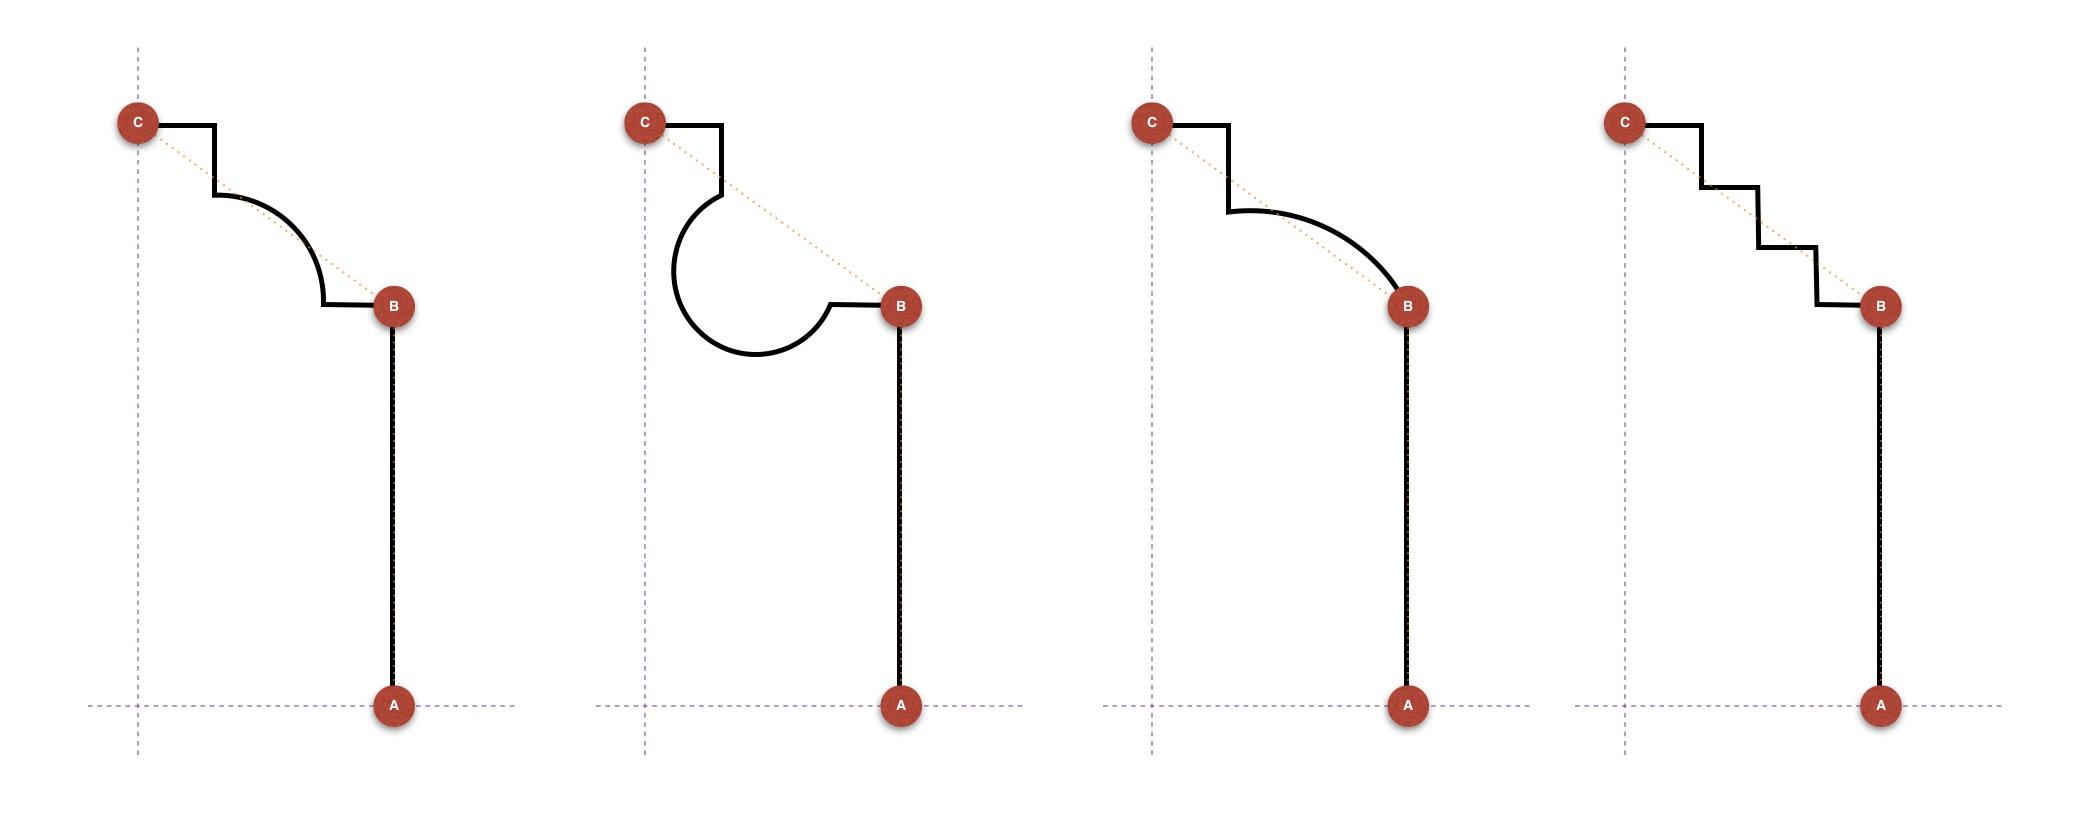 Advanced Archimatix Creating Custom Parametric Shapes